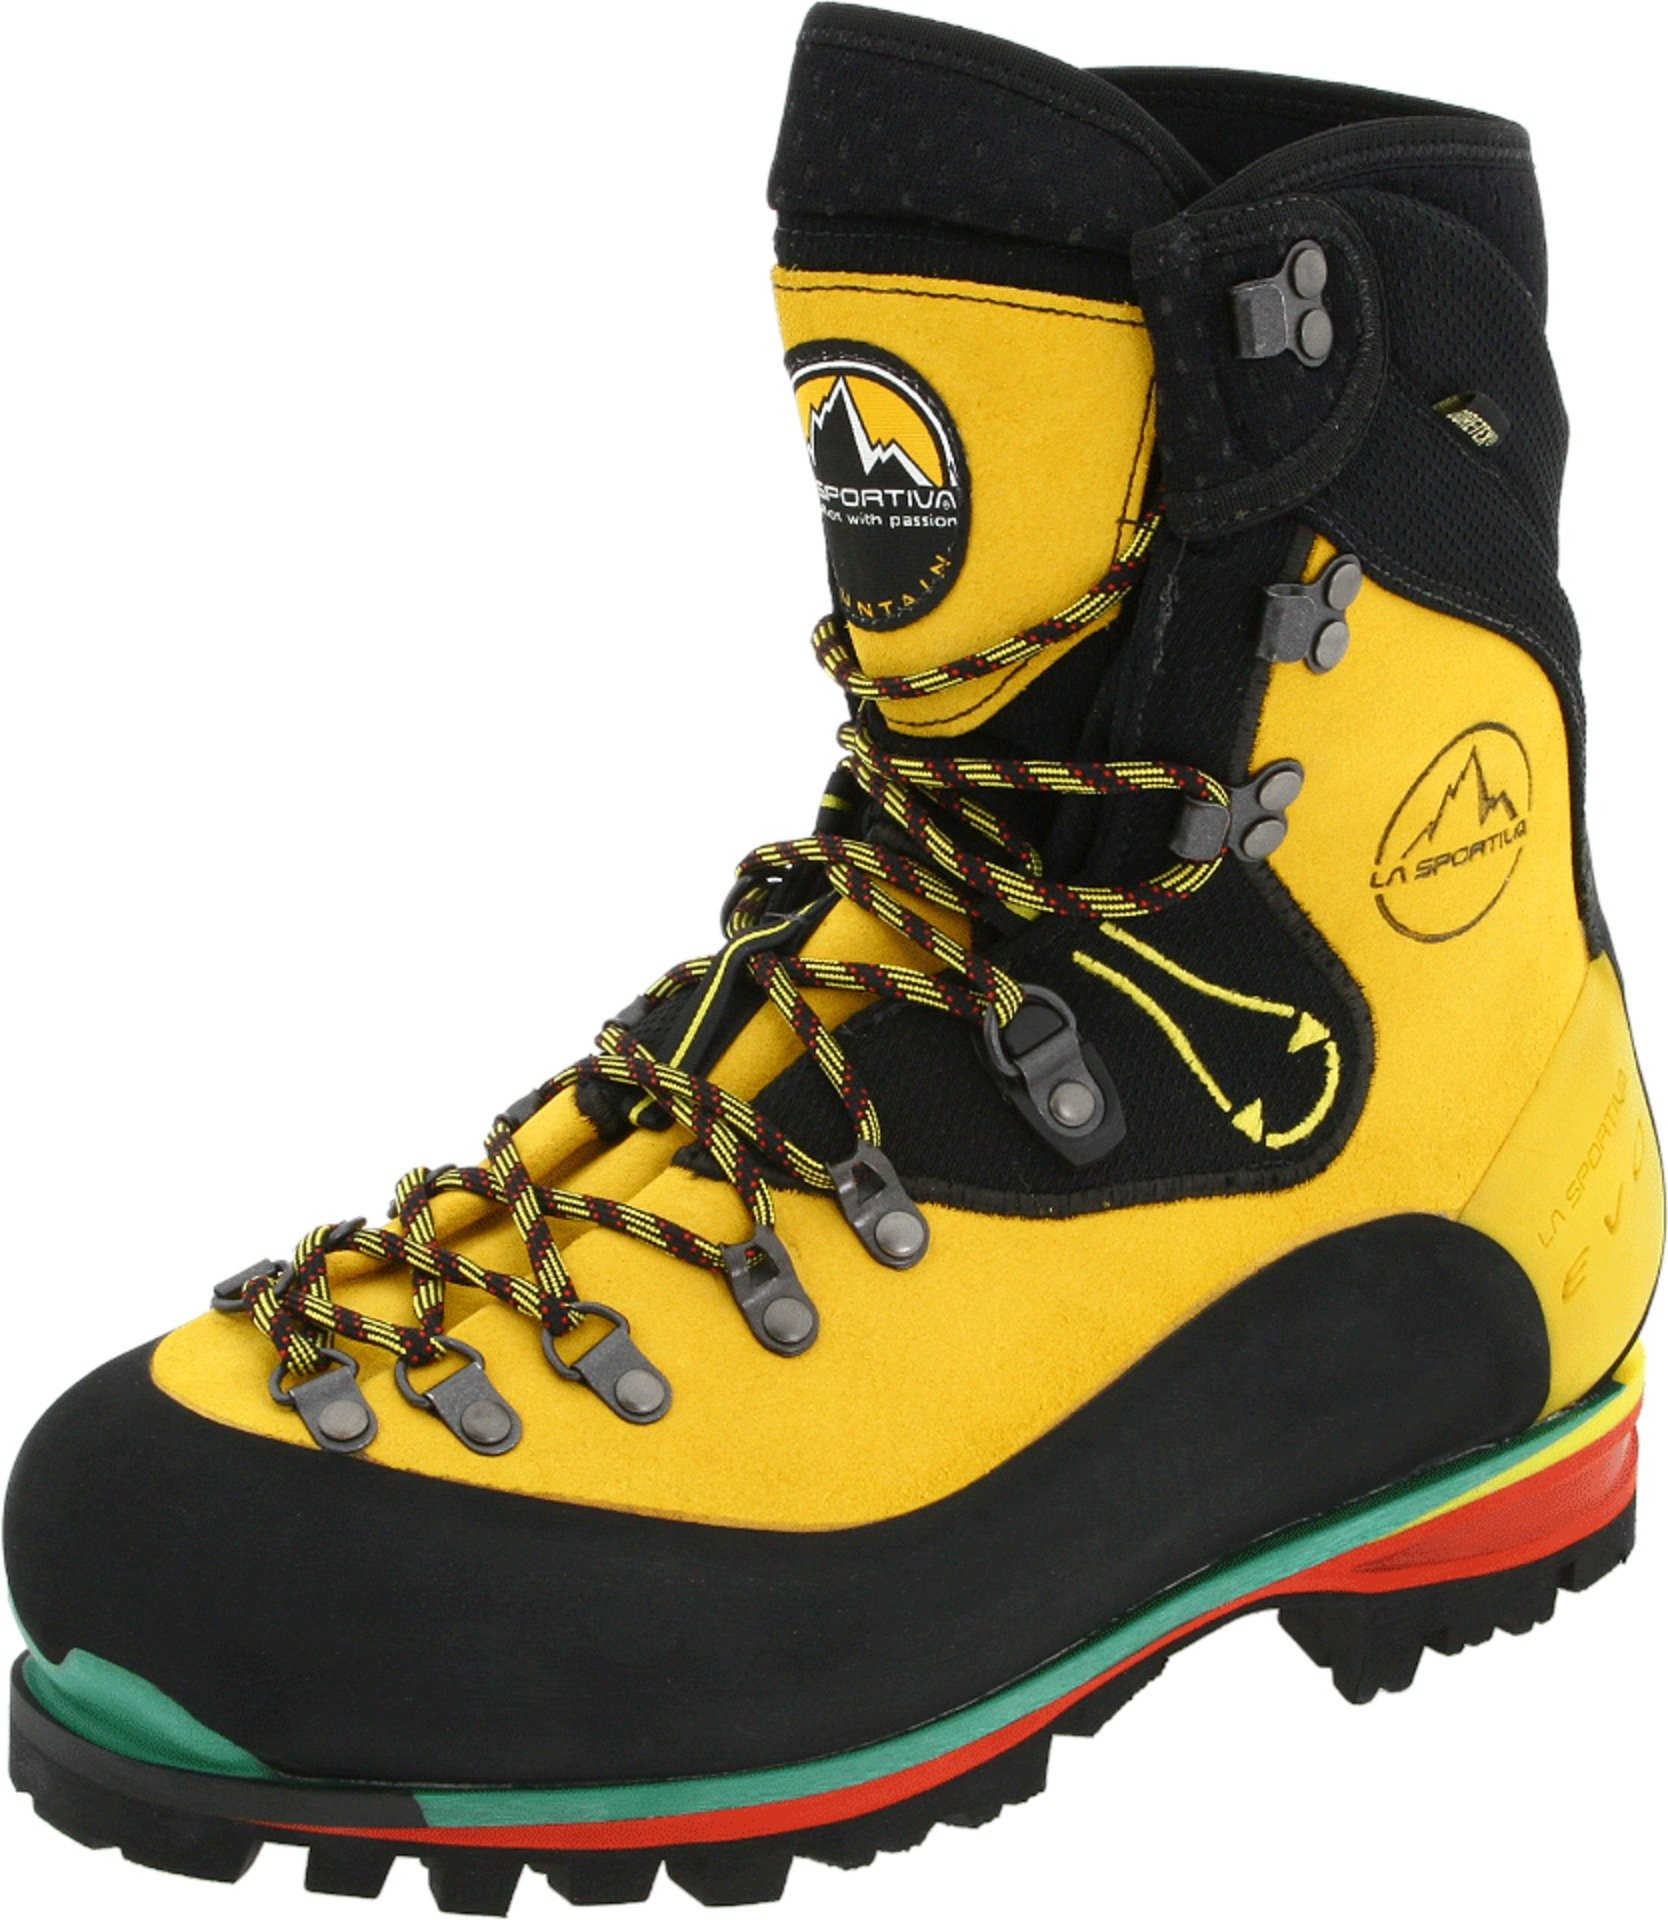 La Sportiva Nepal Evo GTX Mountaineering Boot - Men's Yellow 44.5